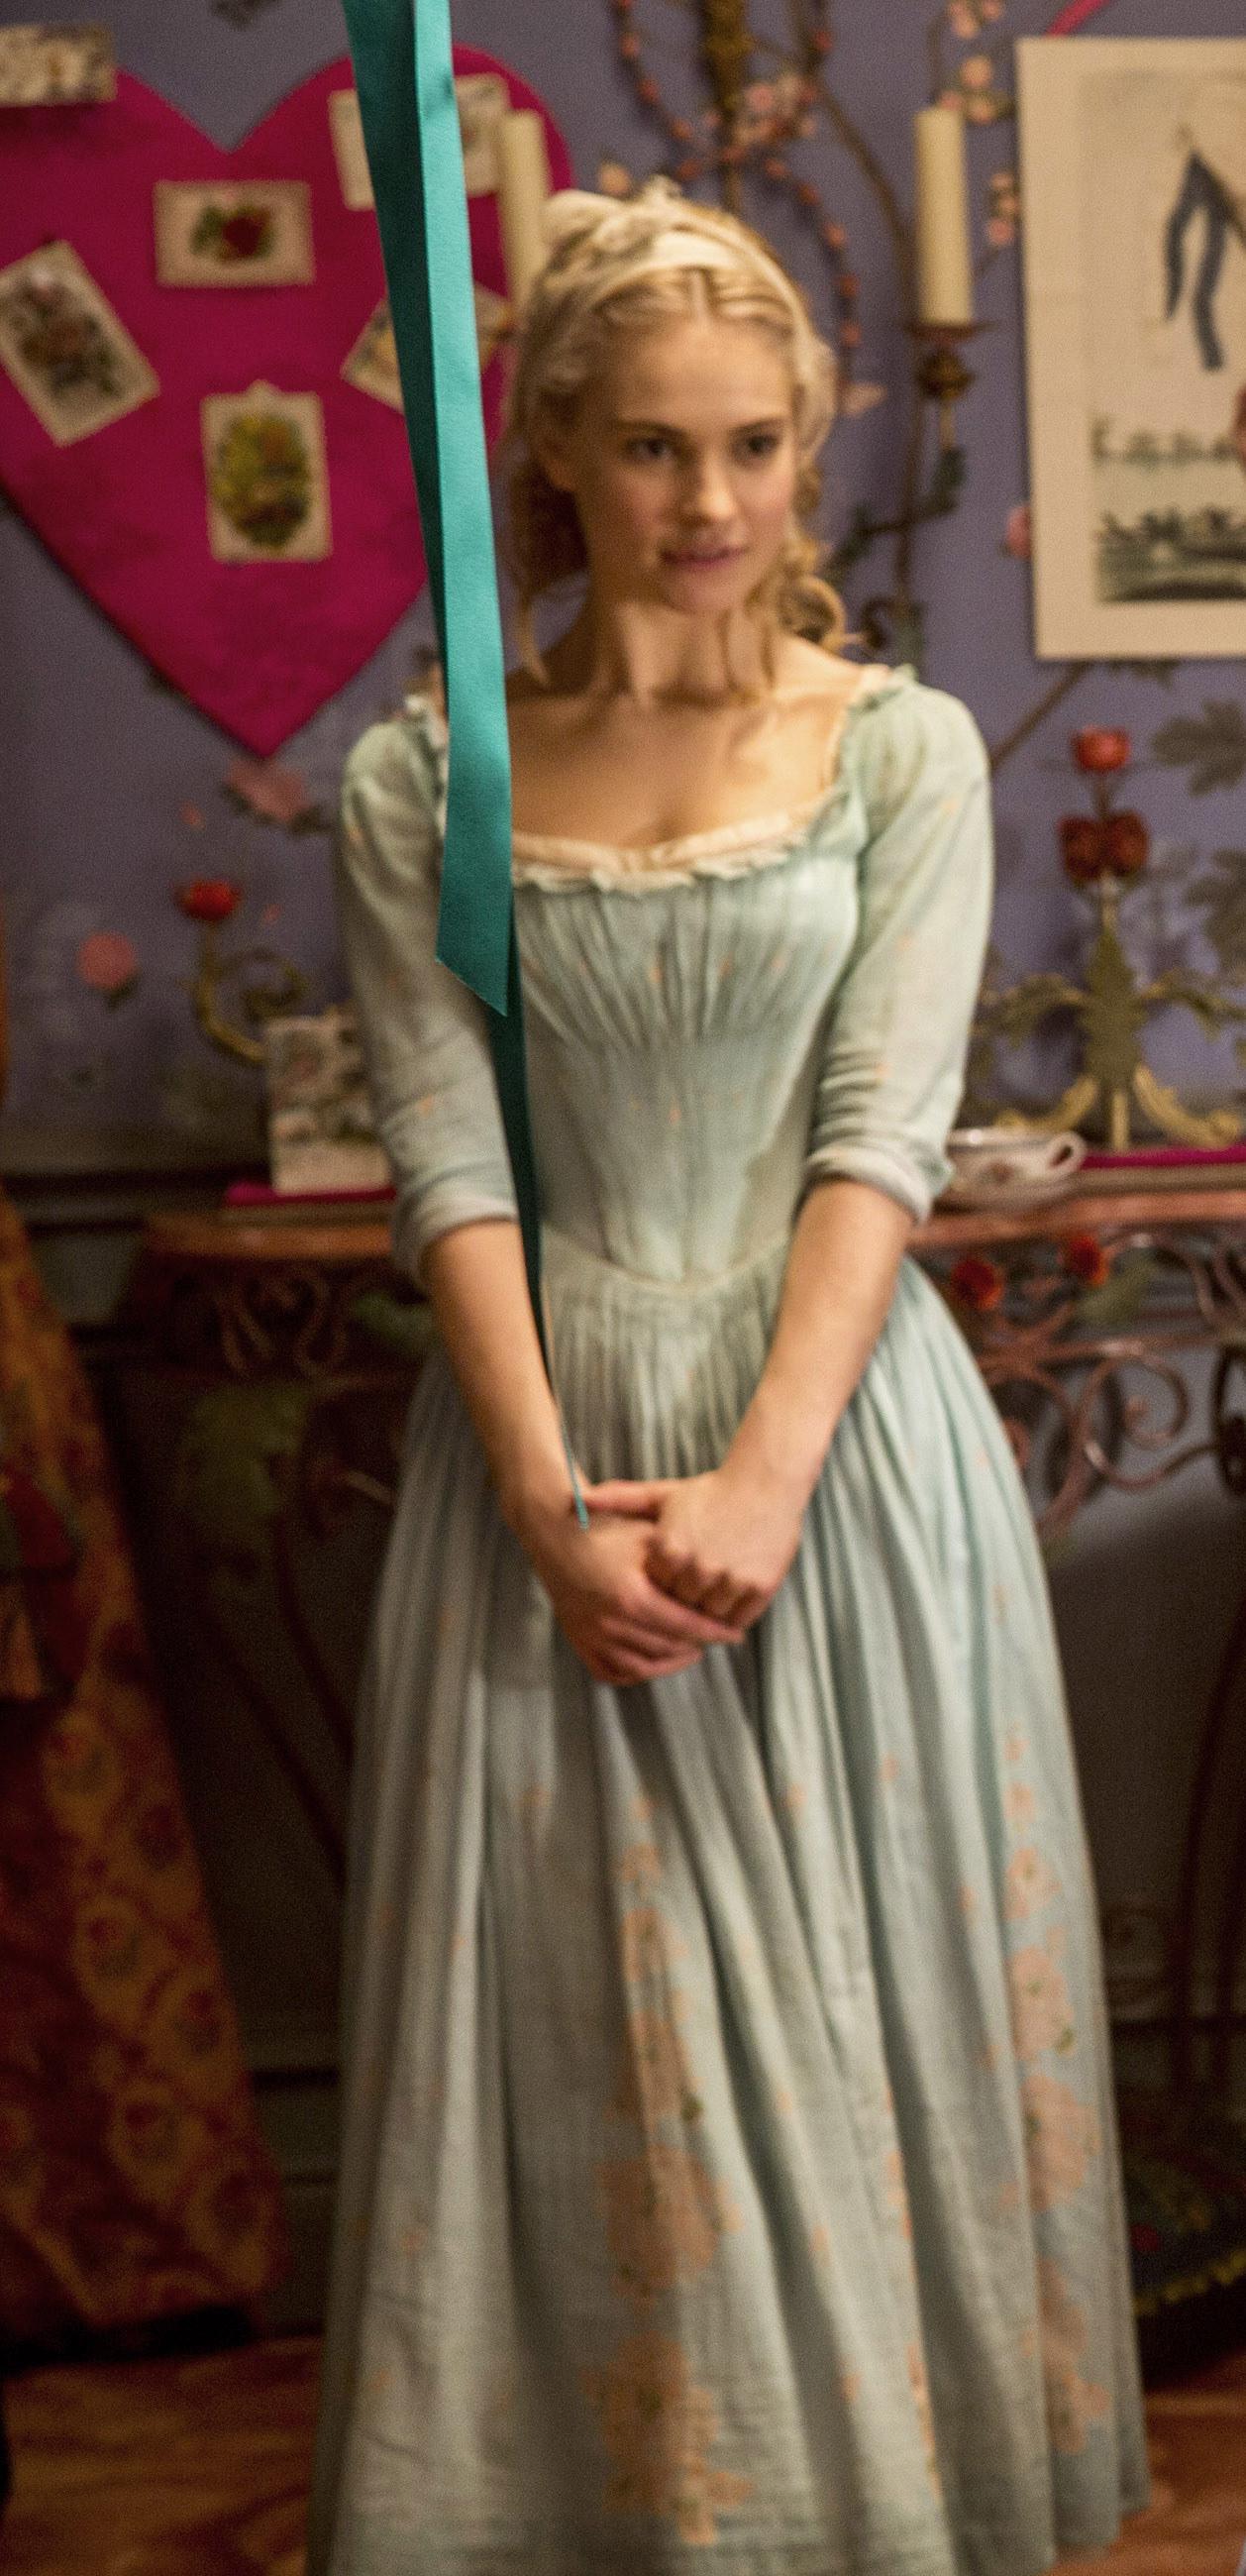 Cinderella wearing a long sleeve dress